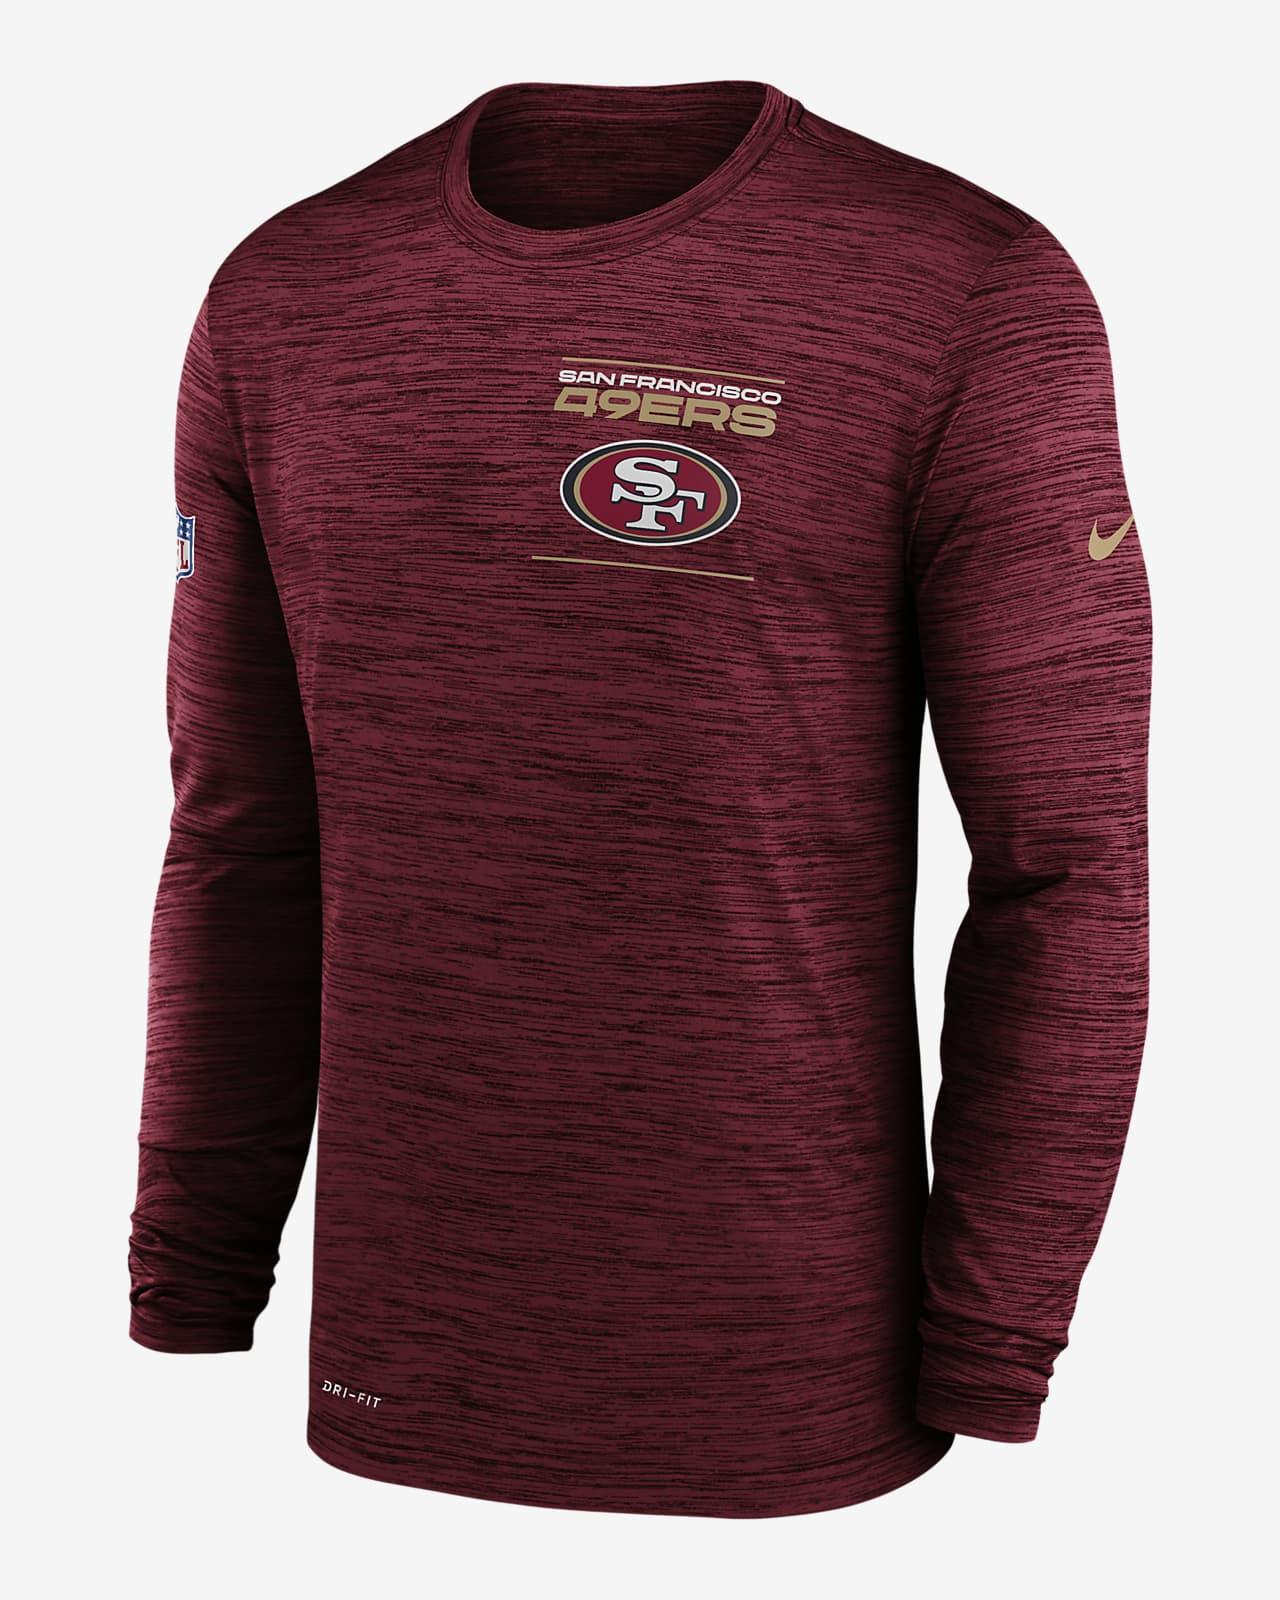 Nike Dri-FIT Sideline Velocity Legend (NFL San Francisco 49ers) Men's Long-Sleeve T-Shirt